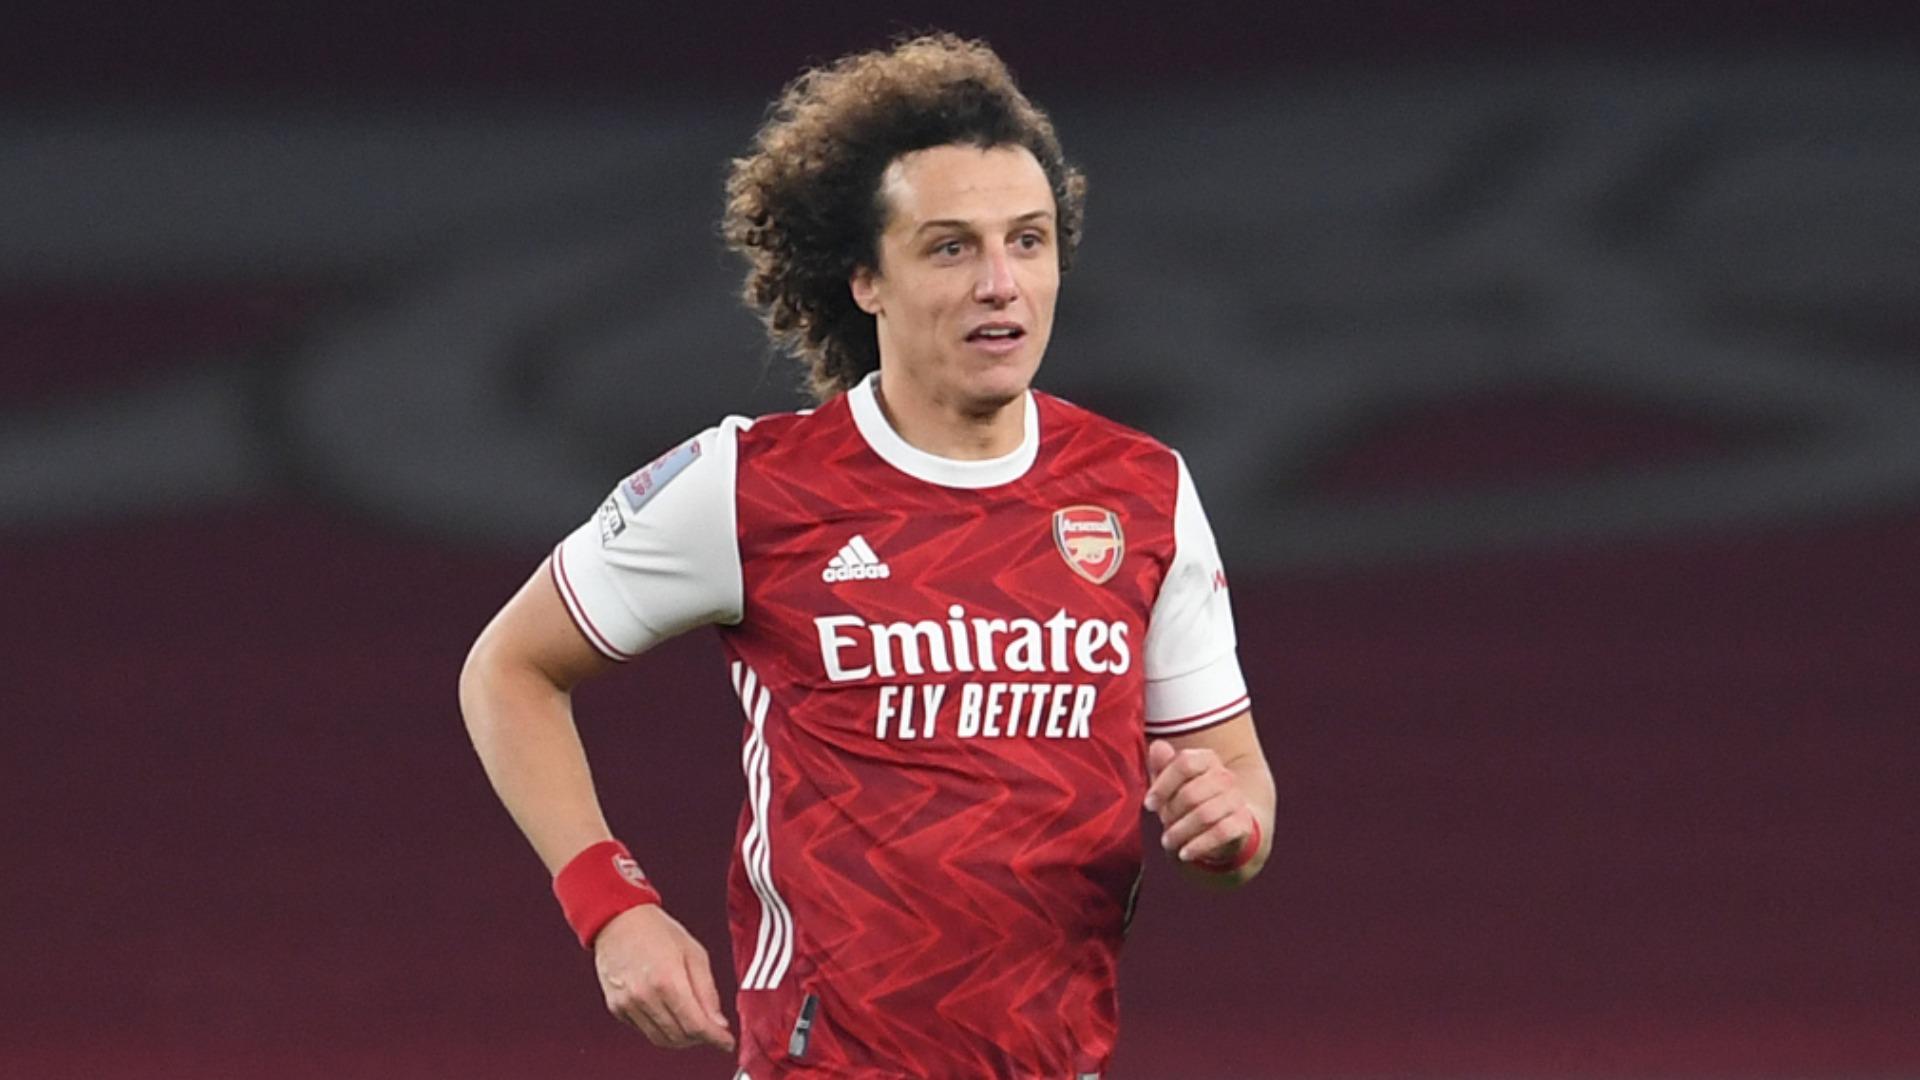 David Luiz could earn new Arsenal contract - Arteta